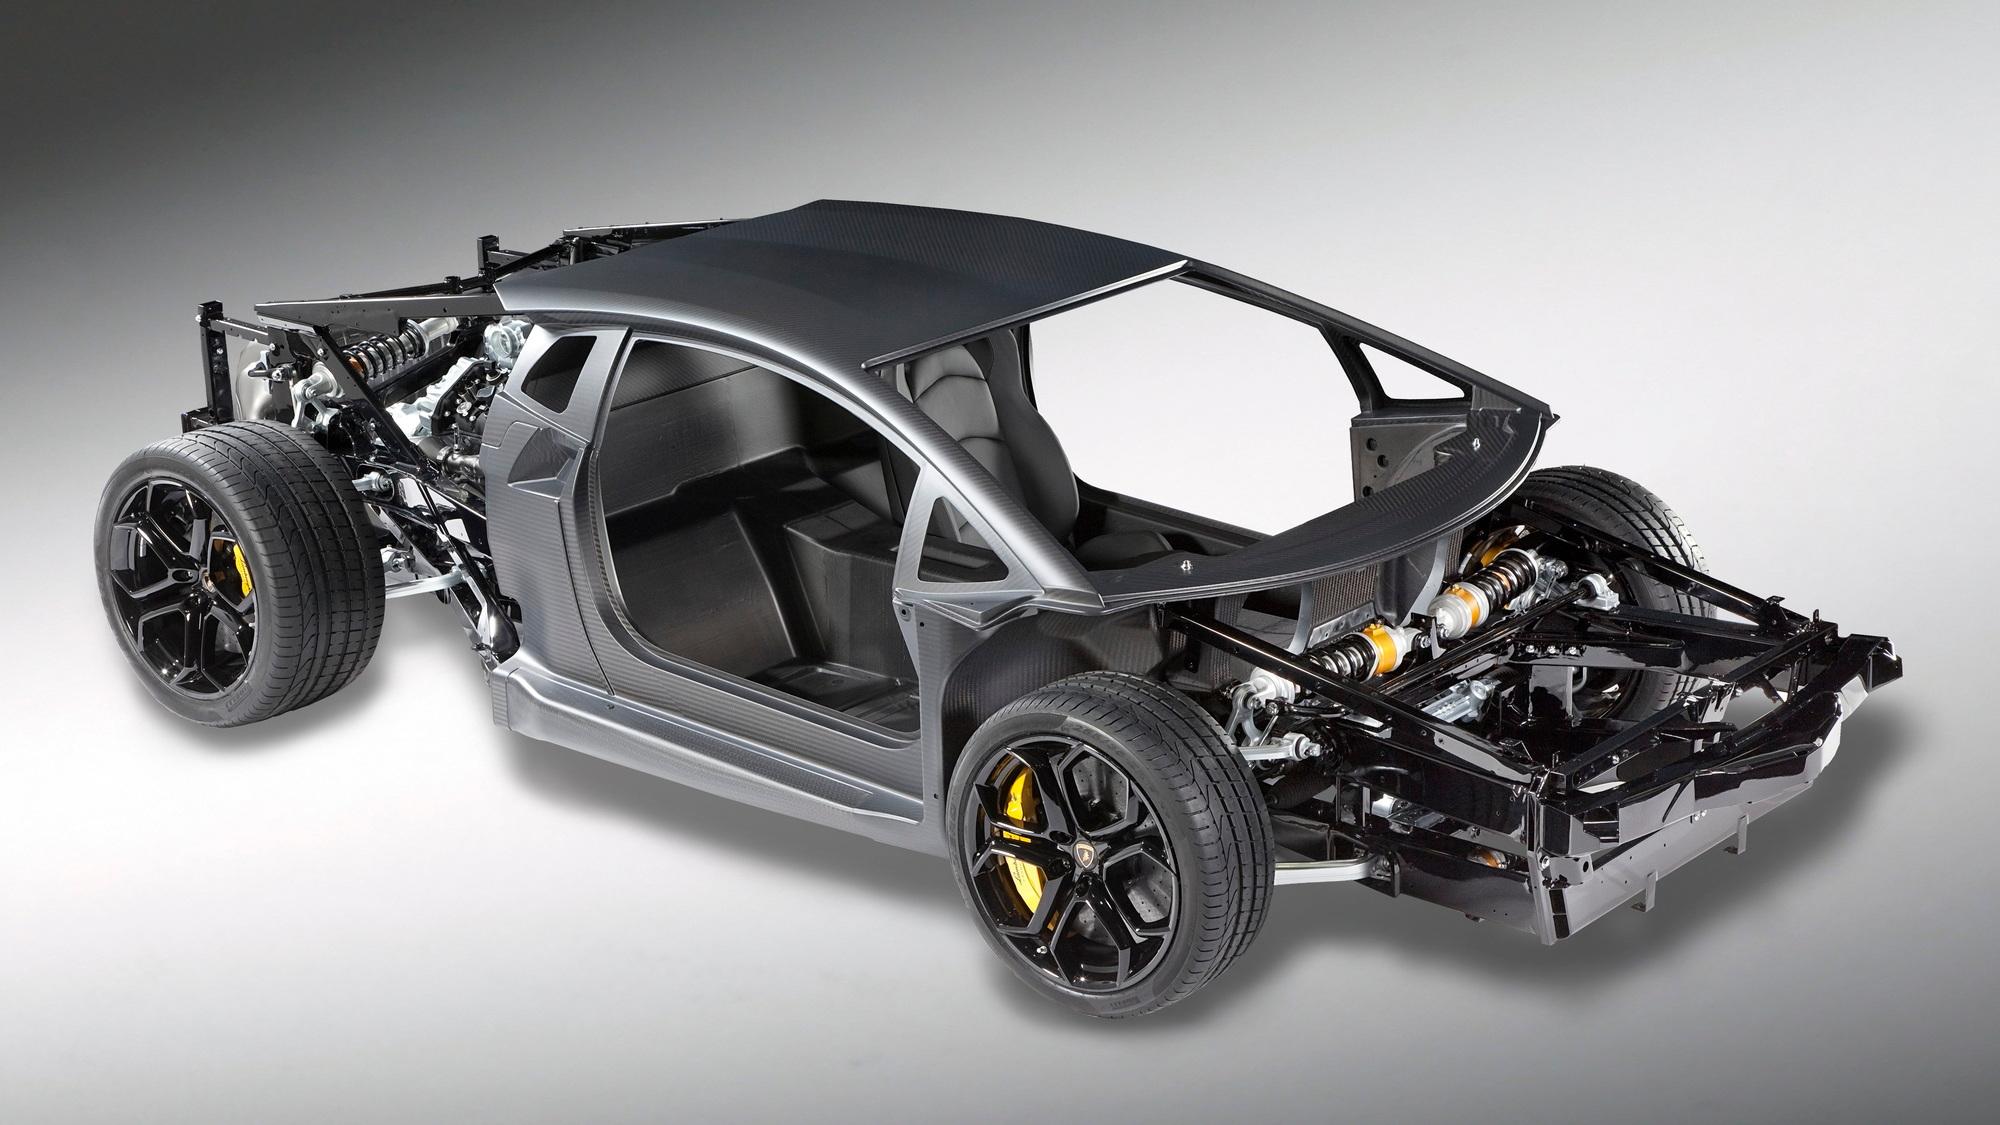 Lamborghini Aventador LP700-4 rolling chassis